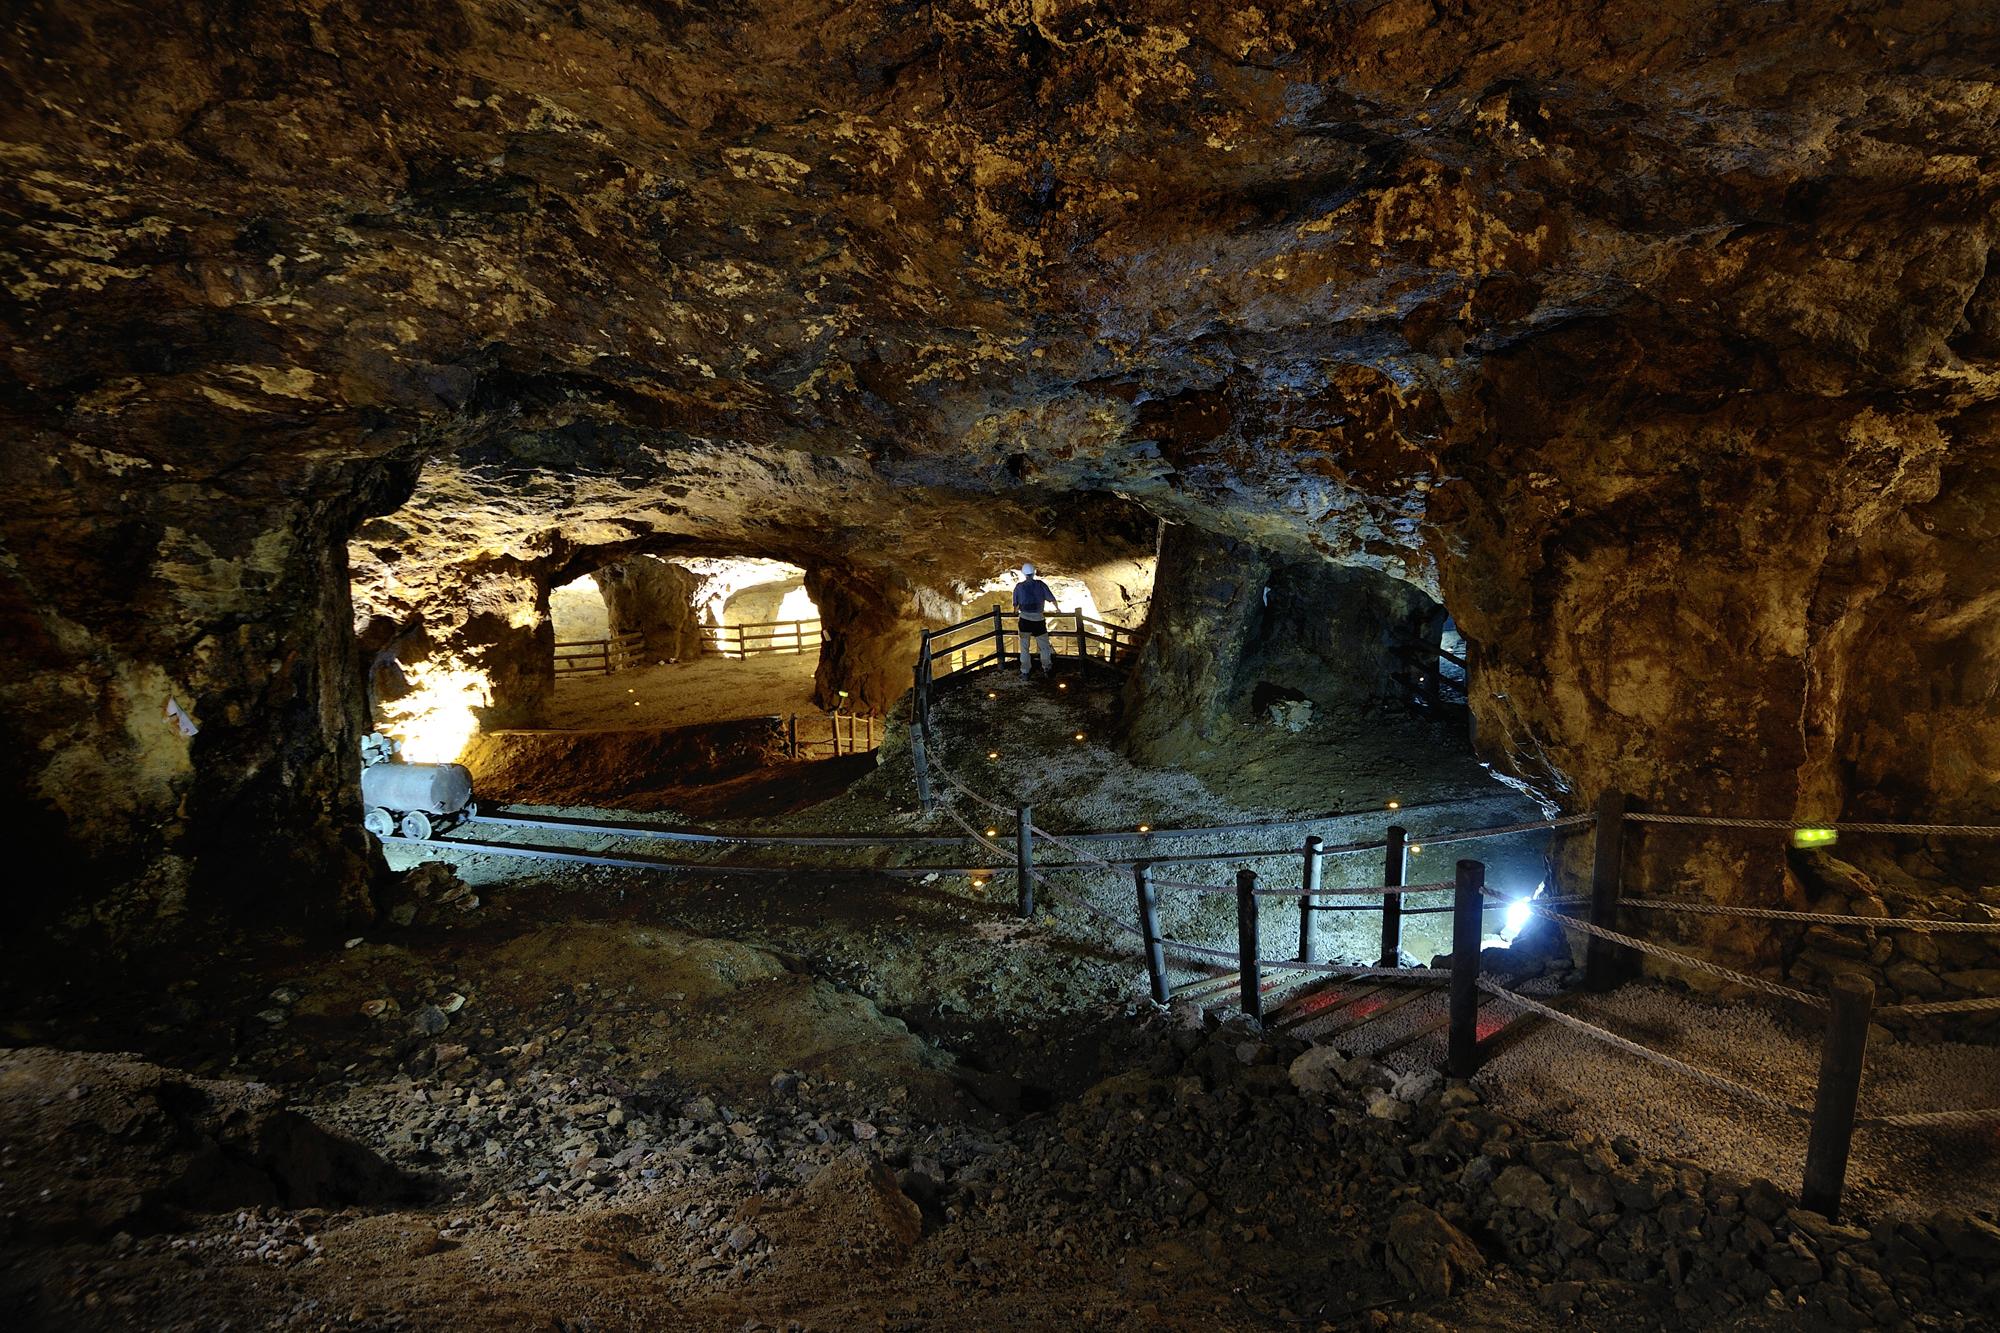 Vista de las Minas de La Unión. Foto J. Zamora